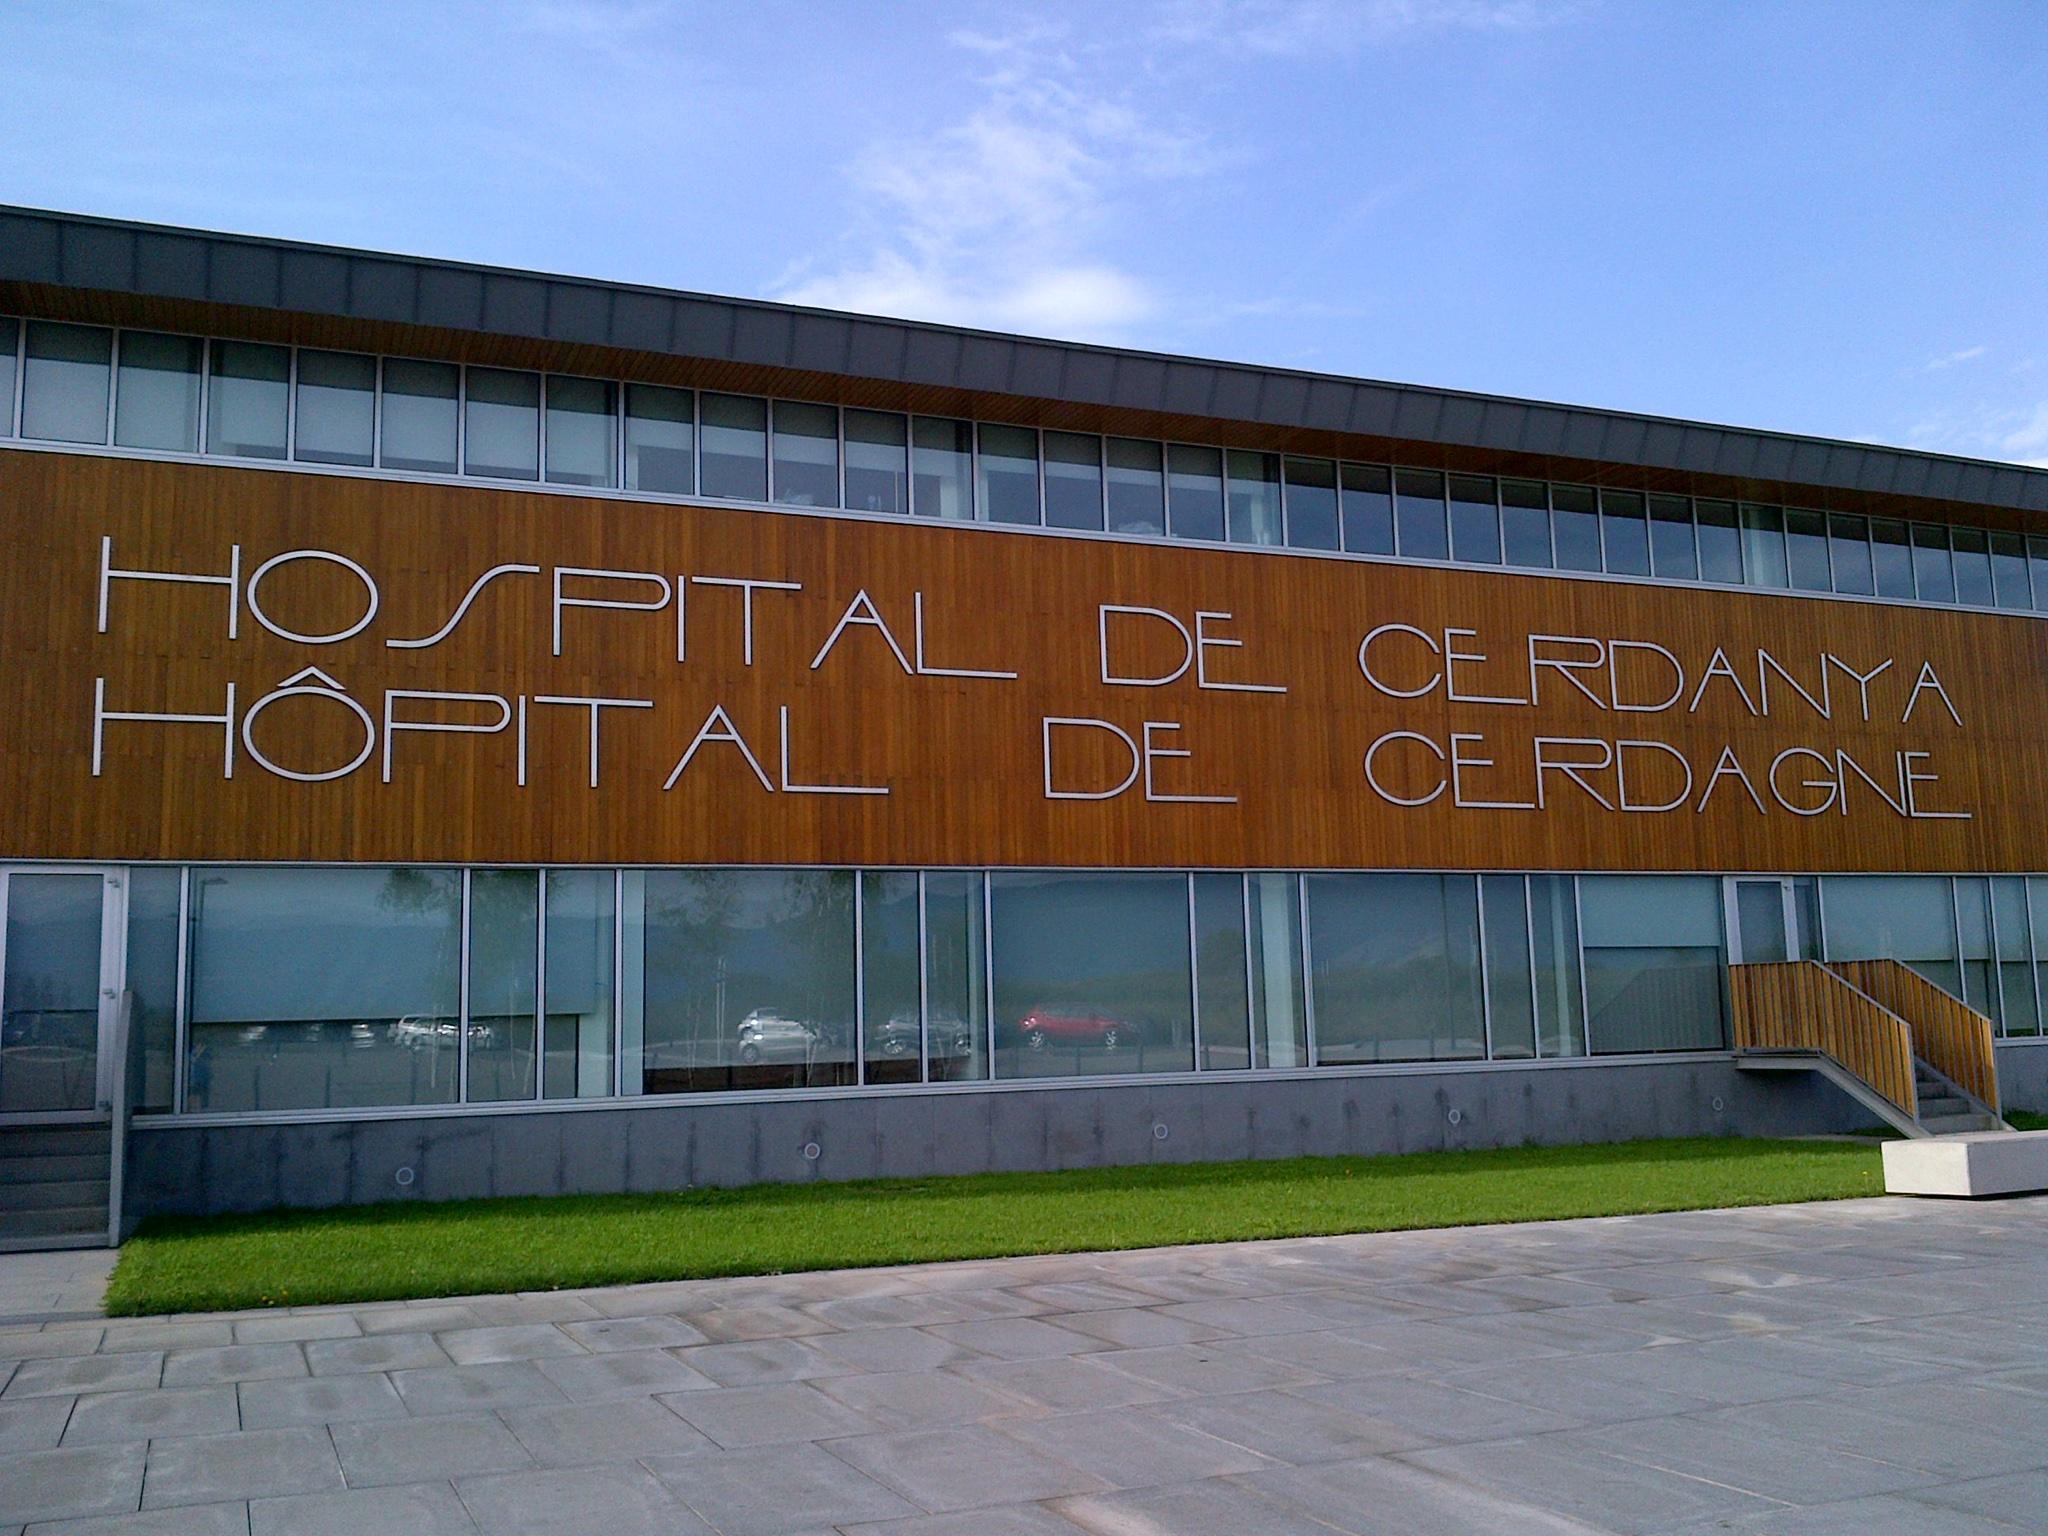 File:Hospital de Cerdanya 2015 04.jpeg - Wikimedia Commons